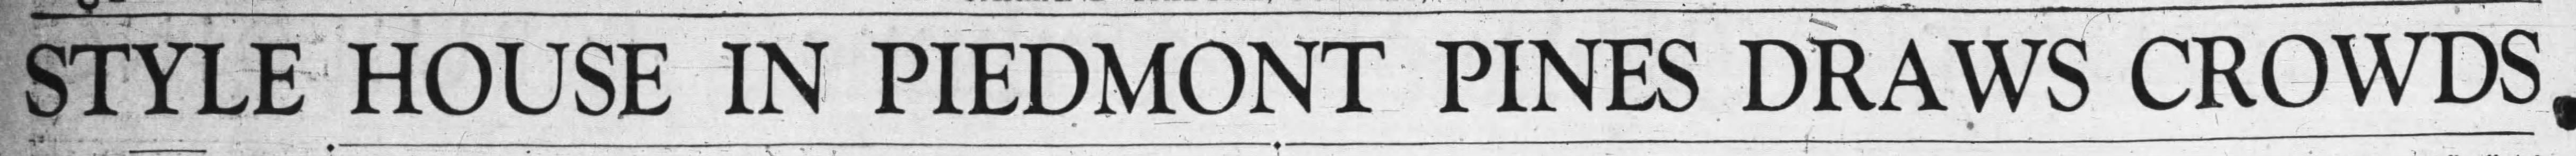 Oakland_Tribune_Sun__May_26__1935_